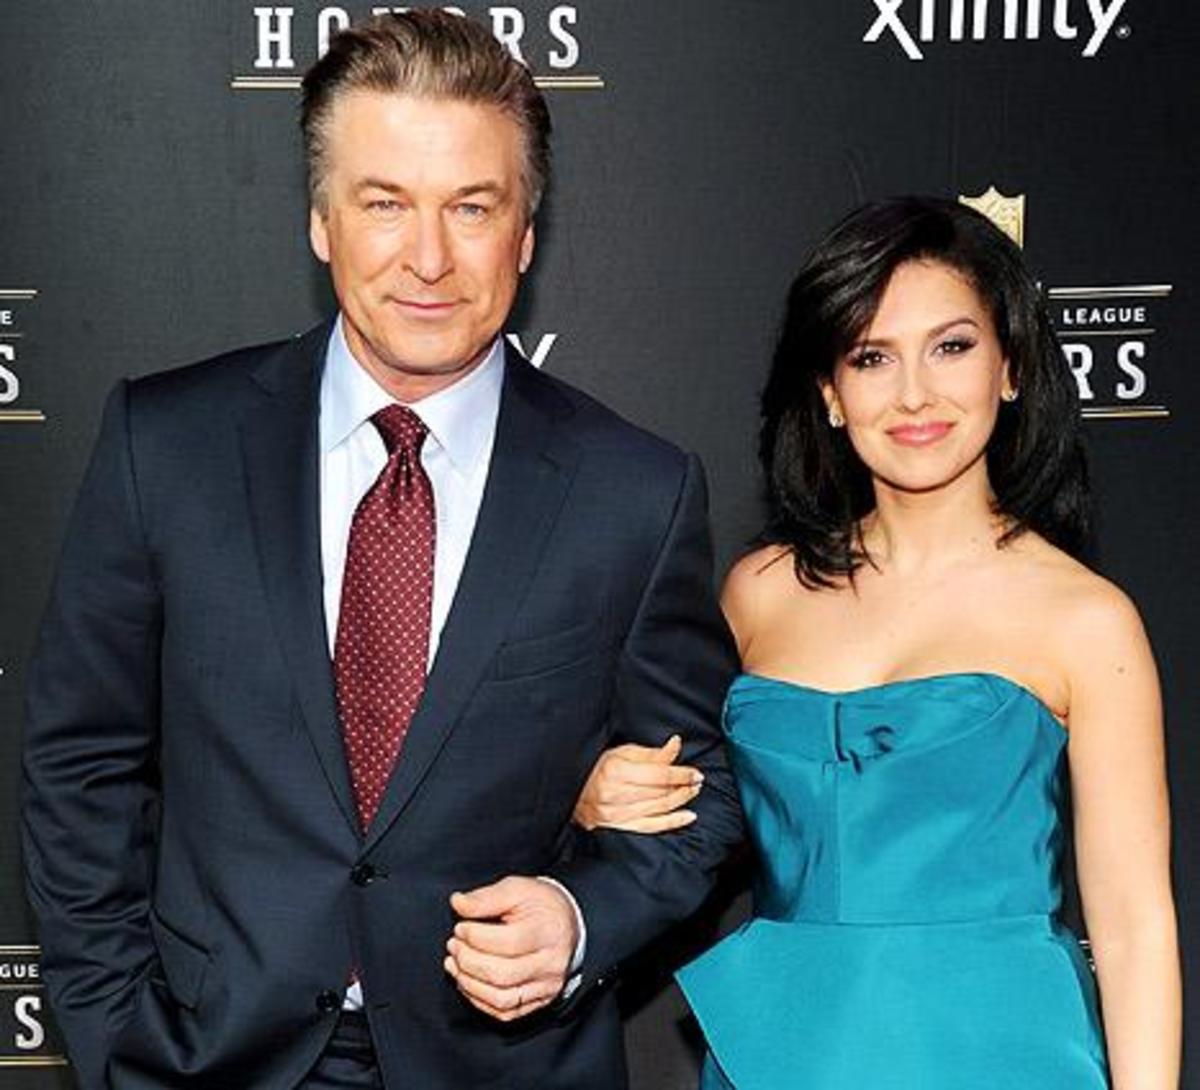 Actor Alec Baldwin (57) and his wife Hilaria (31)